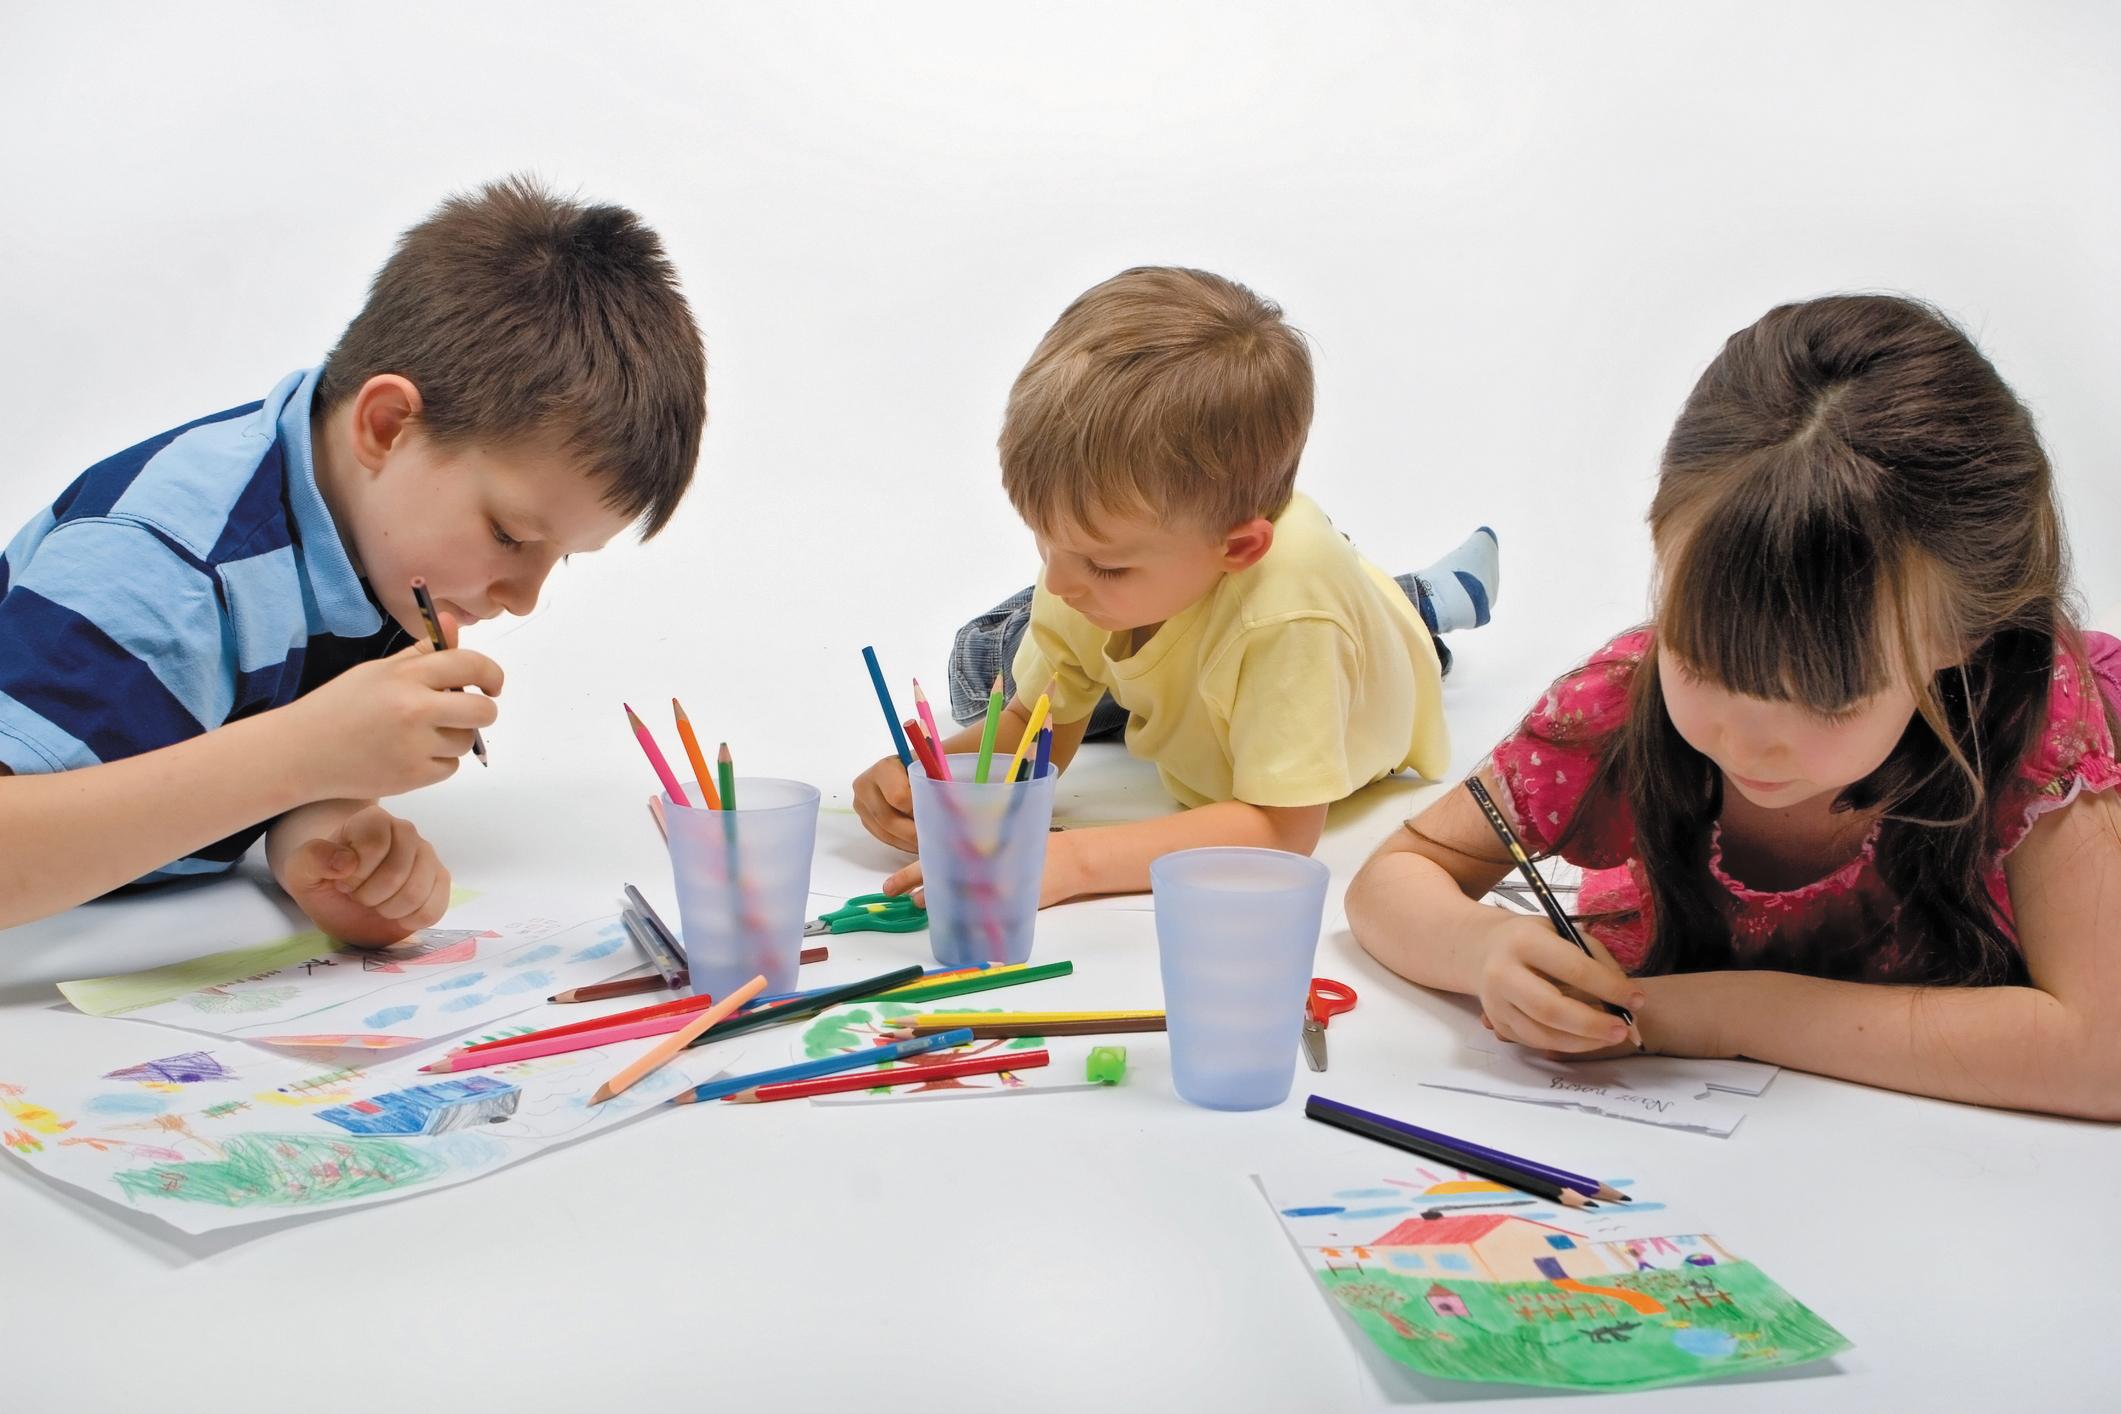 art classes for kids near me - HD2121×1414